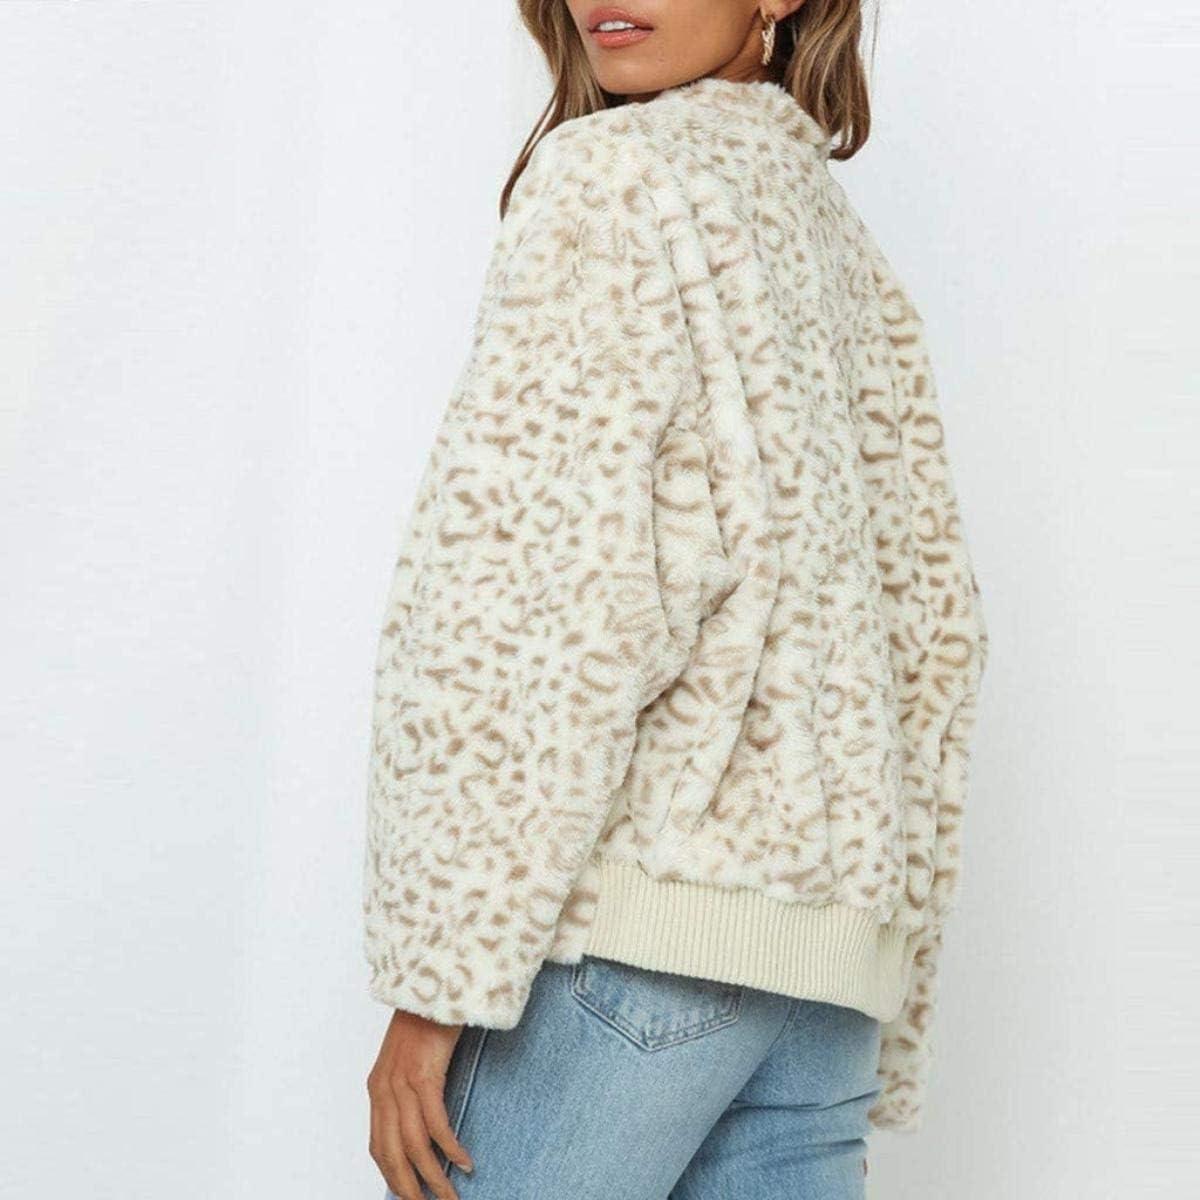 Women's Fashion Leopard Printing Zip Up Jackets Warm Winter Long Sleeve Tops Faux Shearling Shaggy Coat Jacket